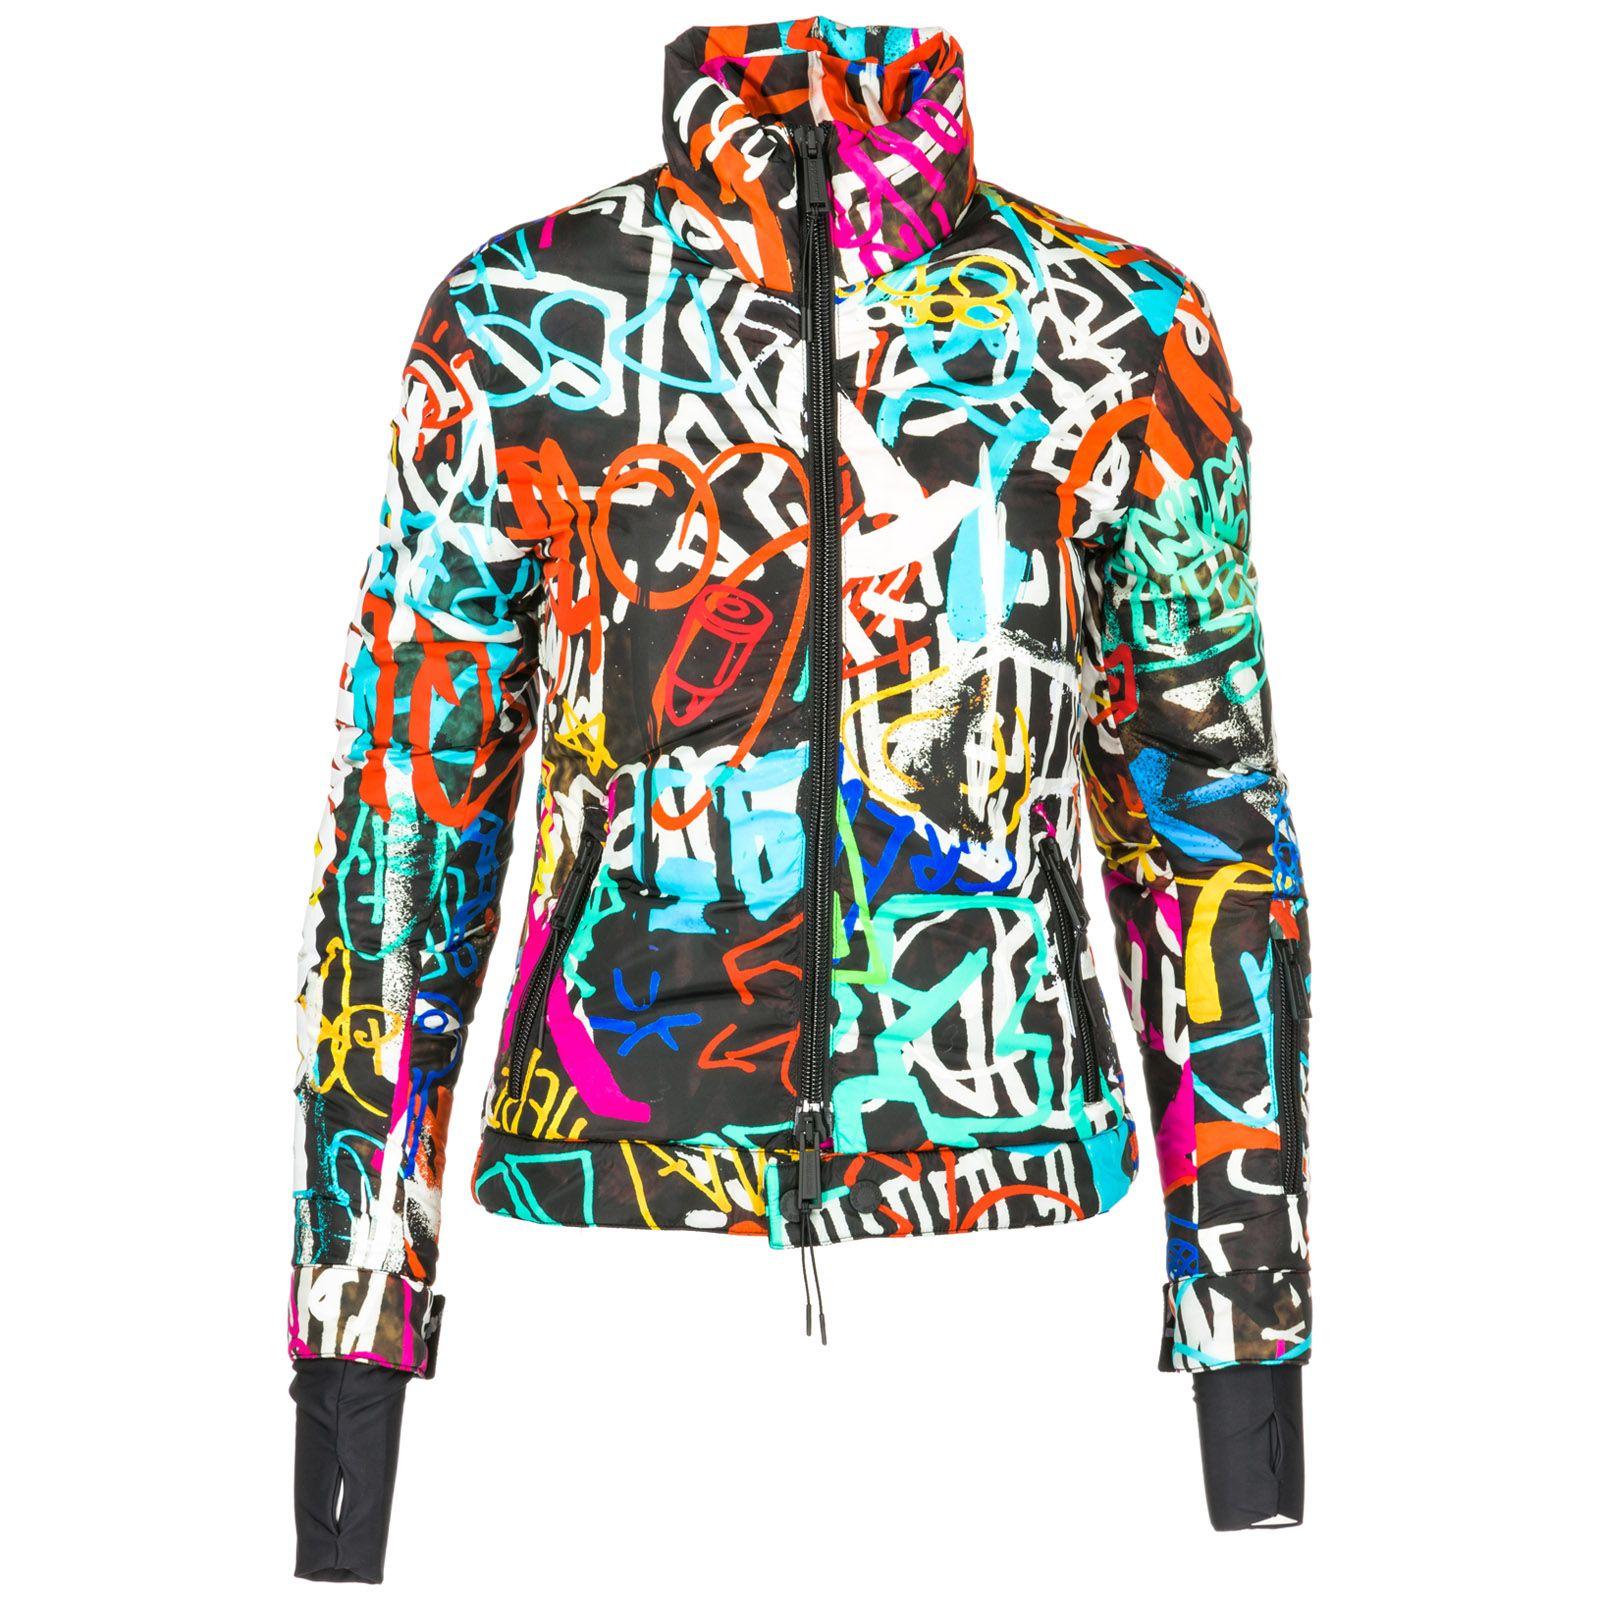 Dsquared2 Piumino Bomber Women S Outerwear Jacket Blouson Dsquared2 Cloth [ 1600 x 1600 Pixel ]